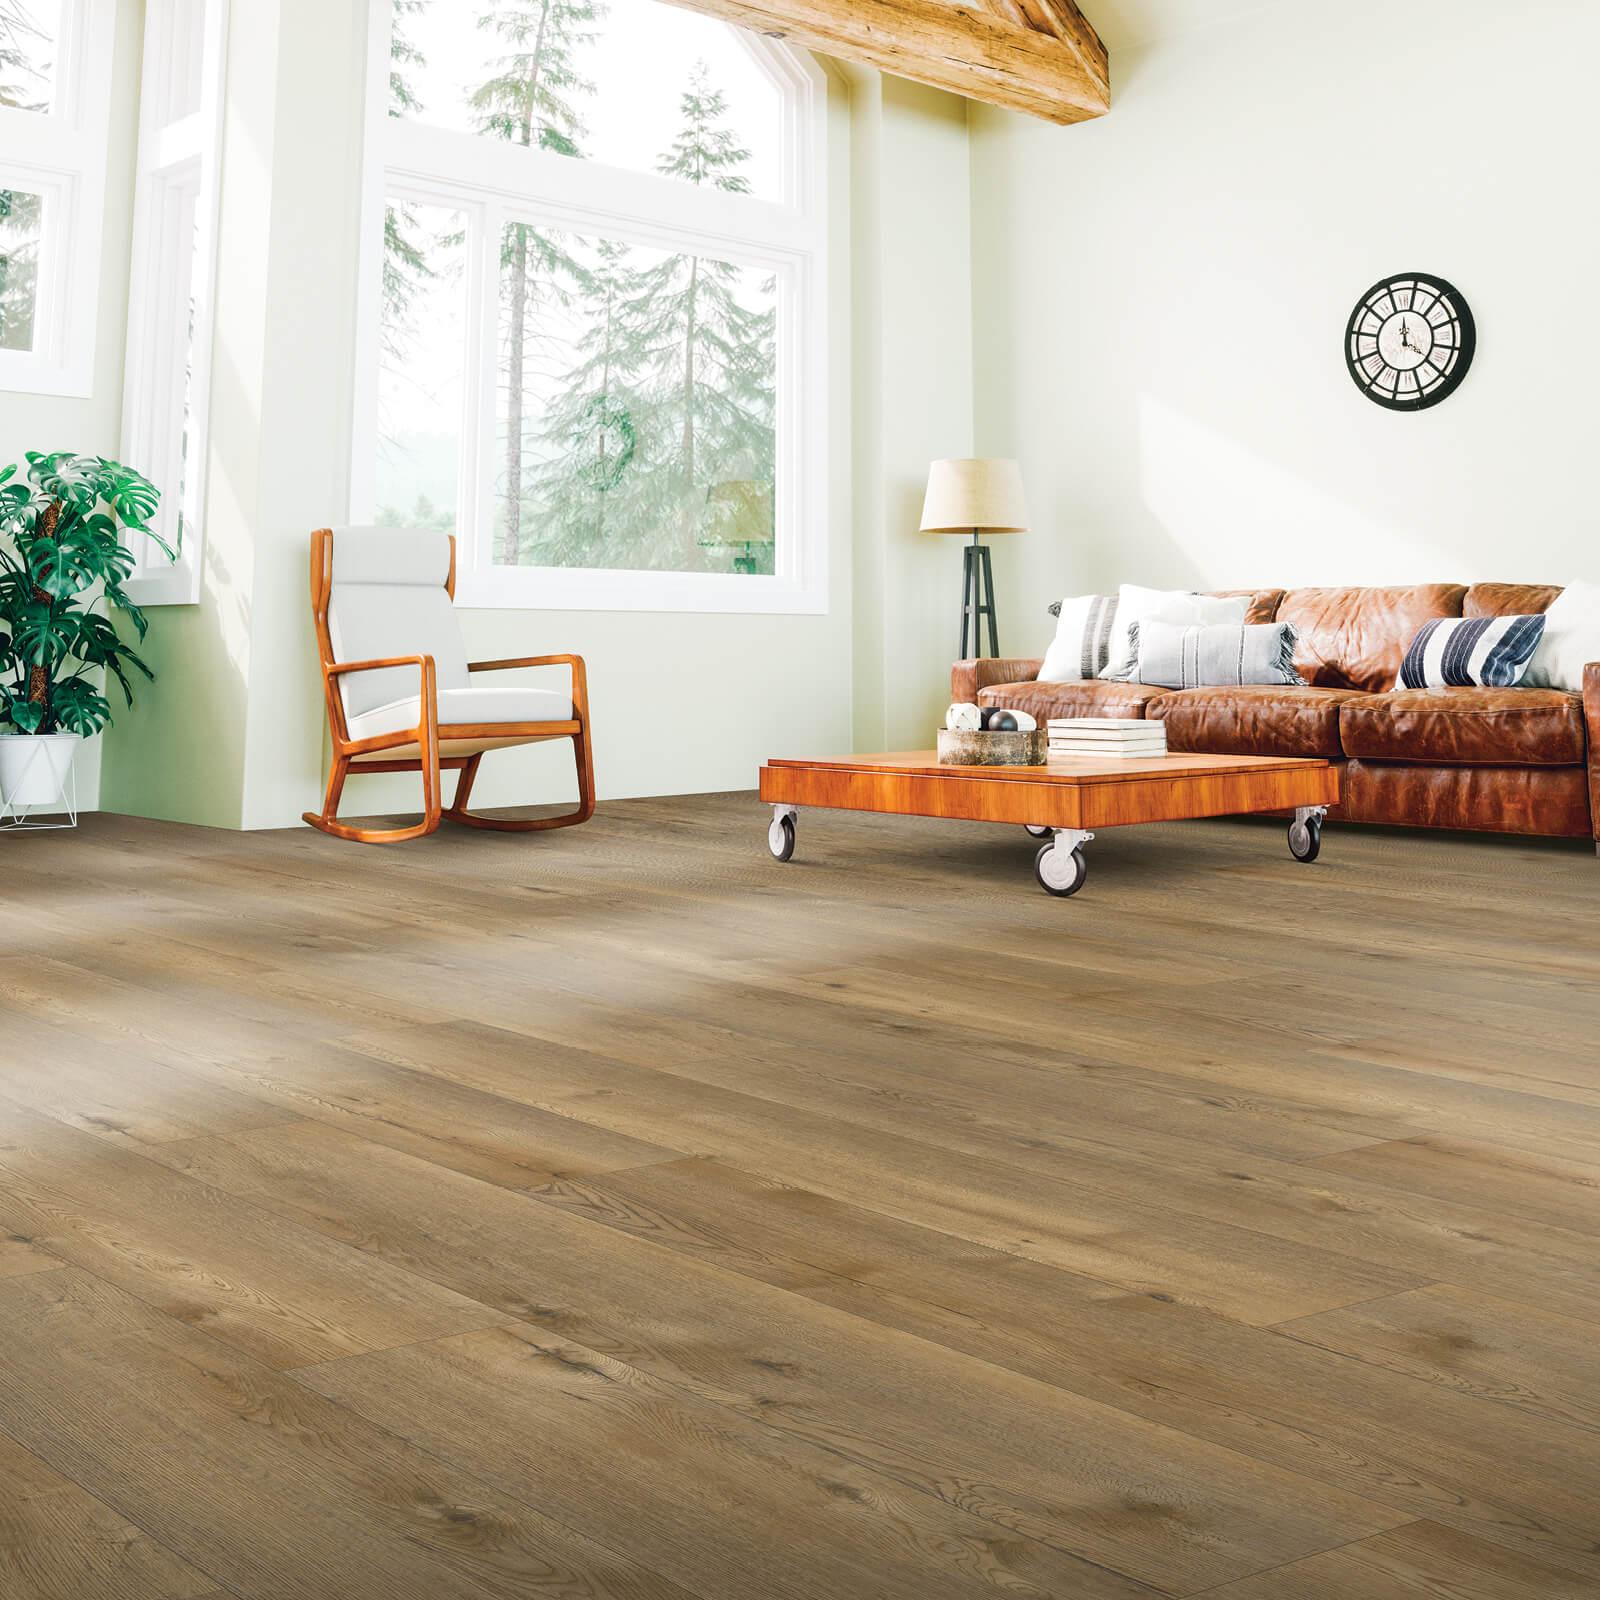 Spacious living room flooring | Dolphin Carpet & Tile